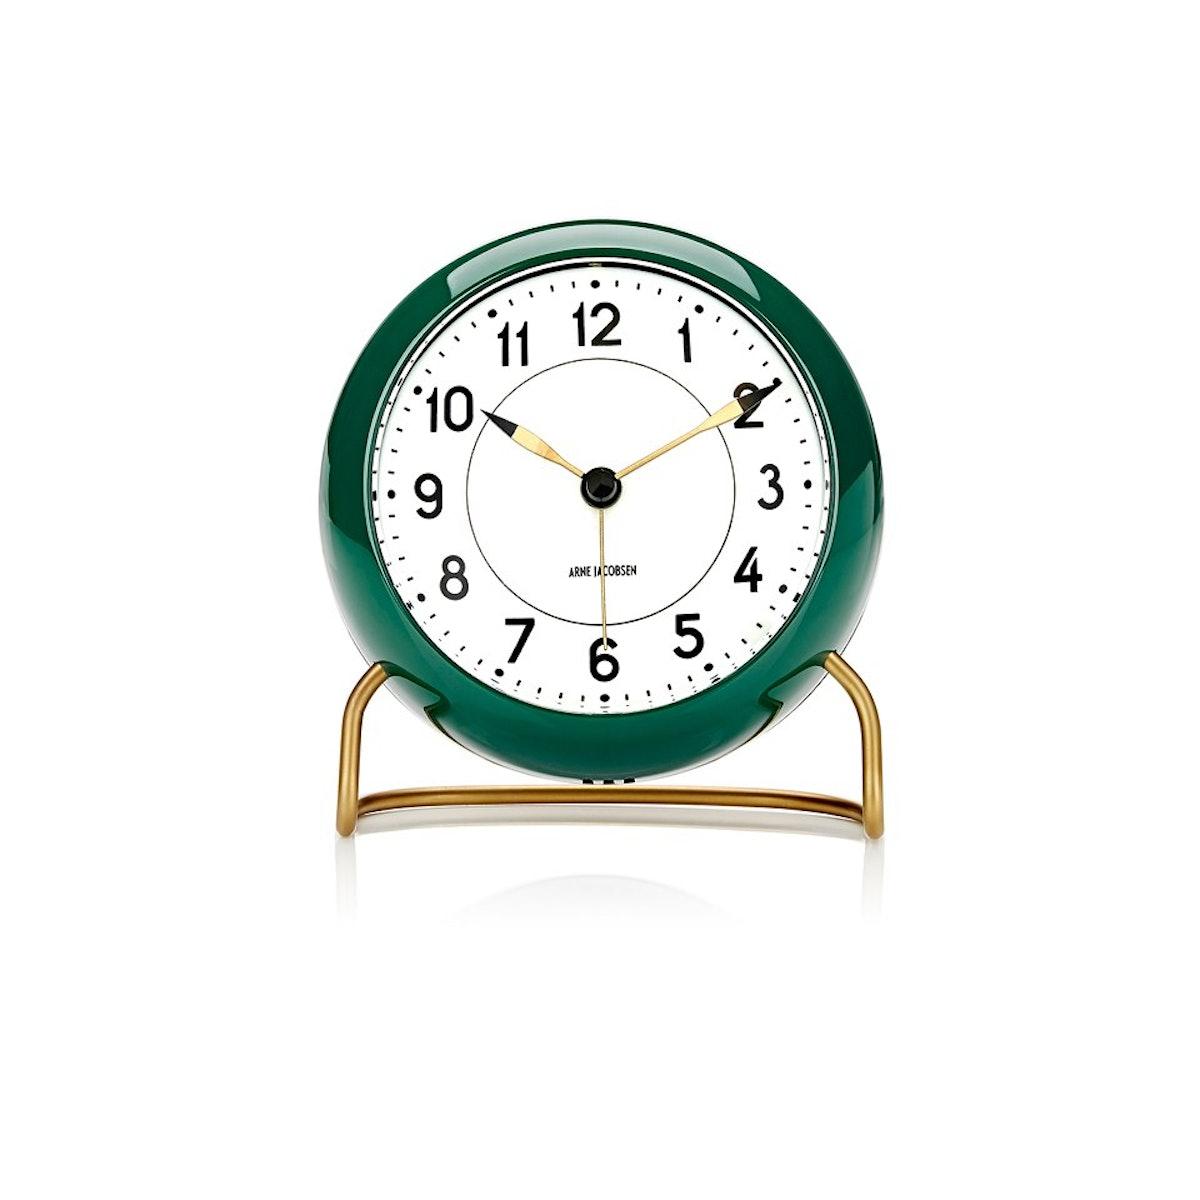 barneys carl mertens table alarm clock.jpg